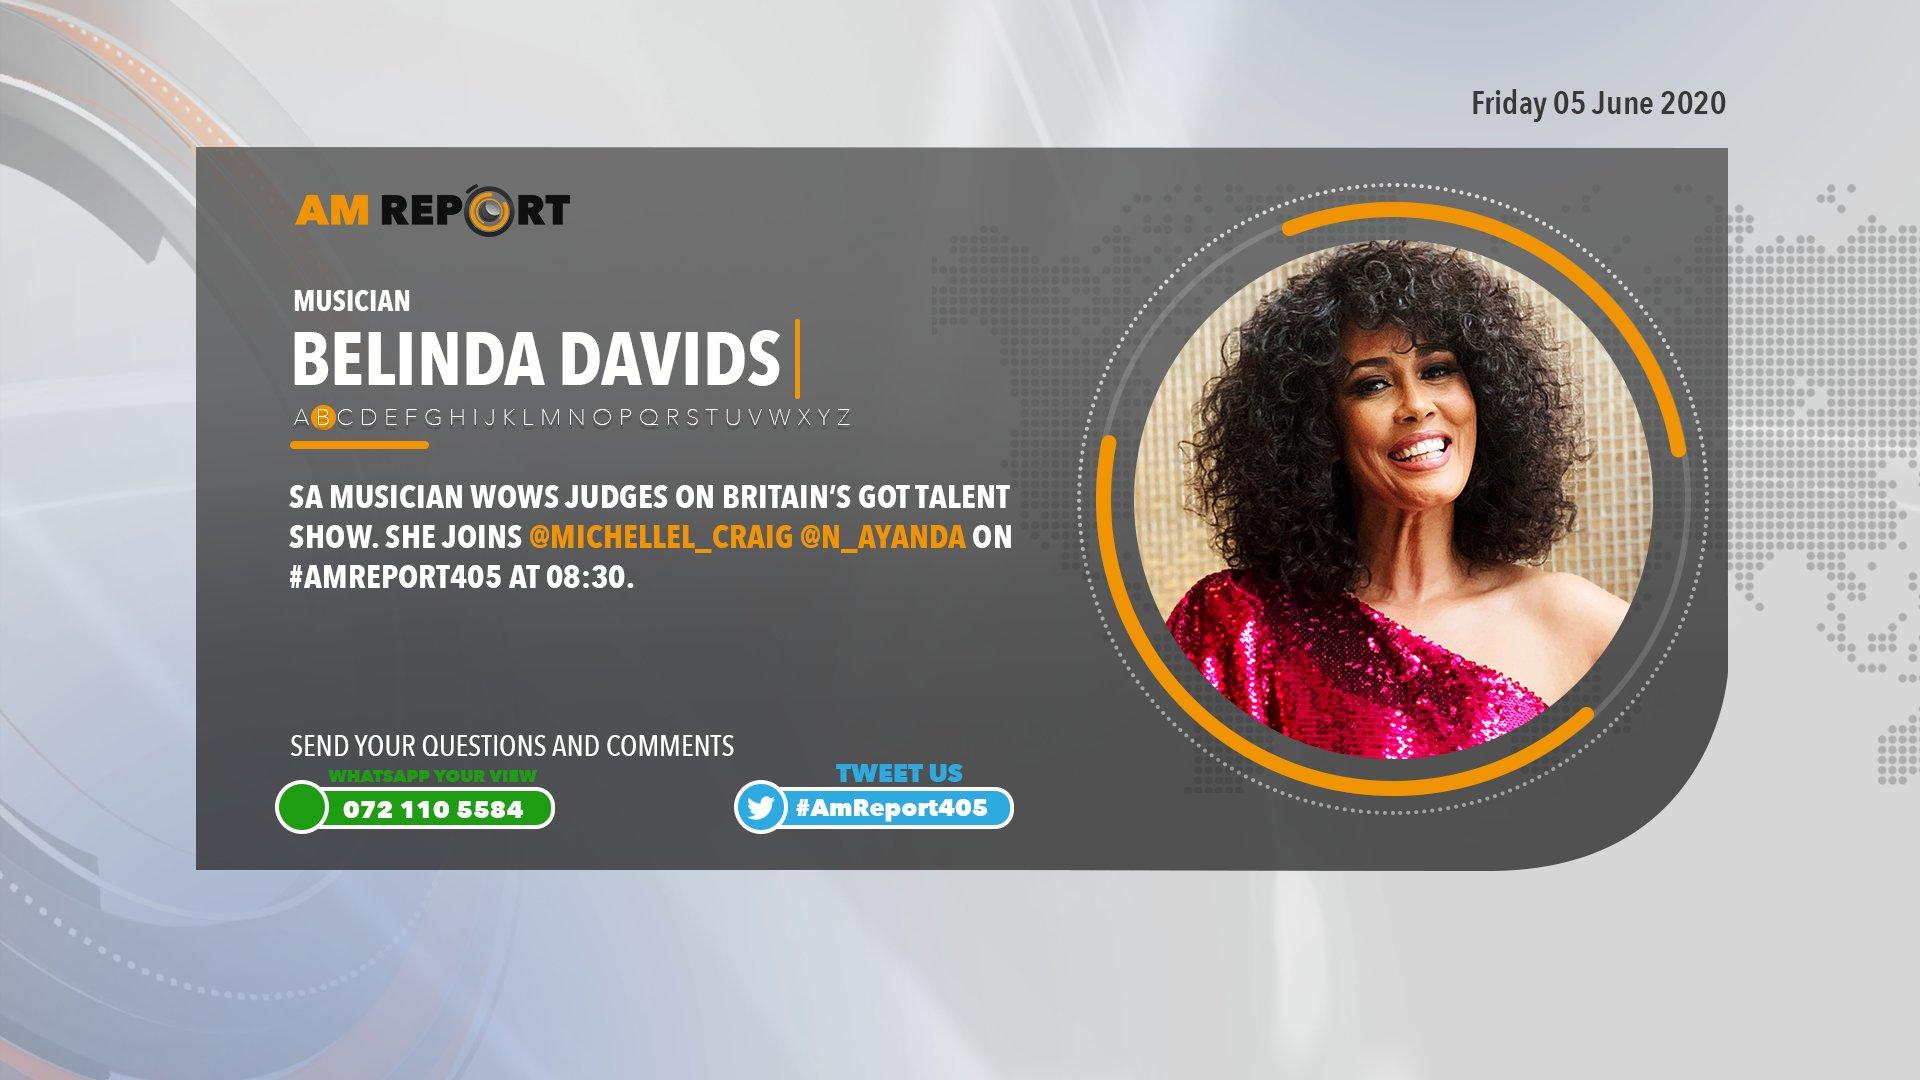 Newzroom Afrika On Twitter Sa Musician Belinda Davids Wows Judges On Britain S Got Talent She Joins Michellel Craig N Ayanda On Amreport405 At 08 30 Https T Co Rxrix2w6i6